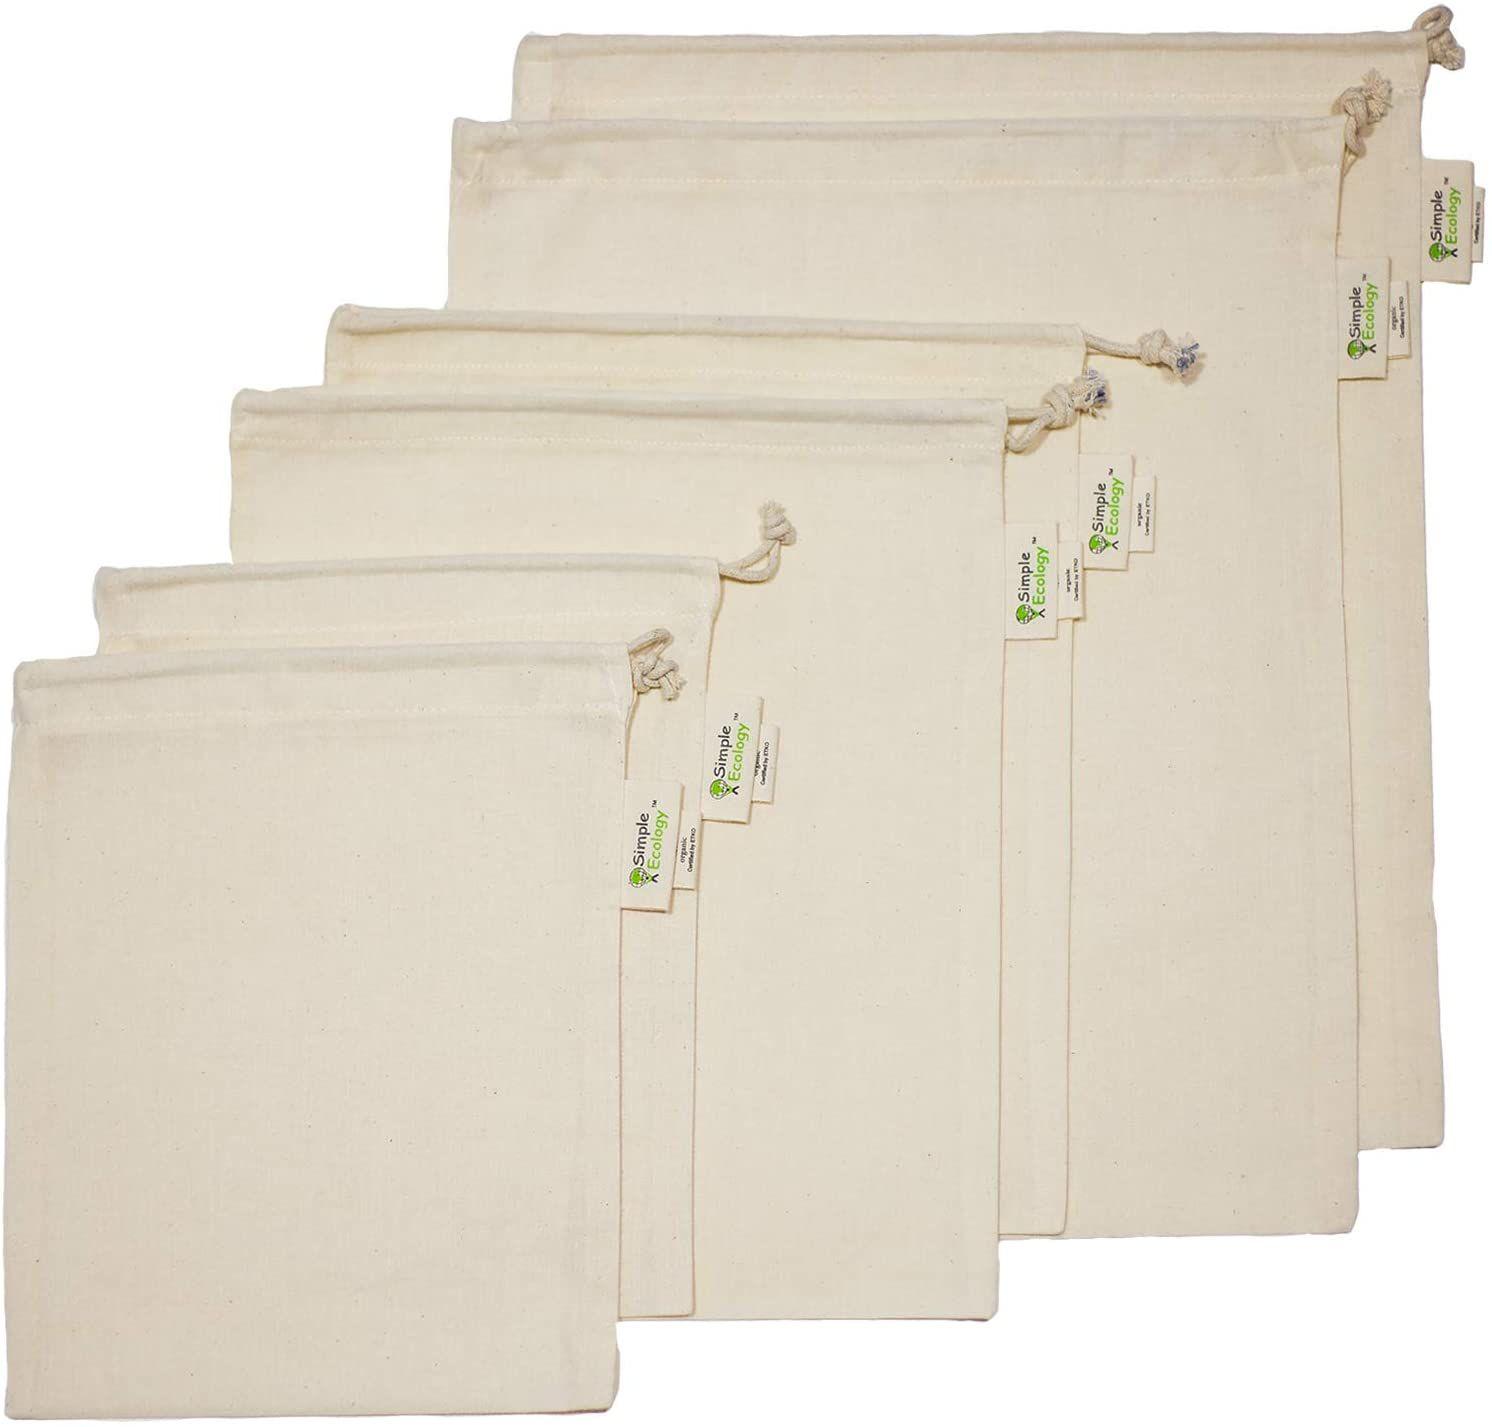 Simple Ecology Reusable Organic Cotton Muslin Produce Bags